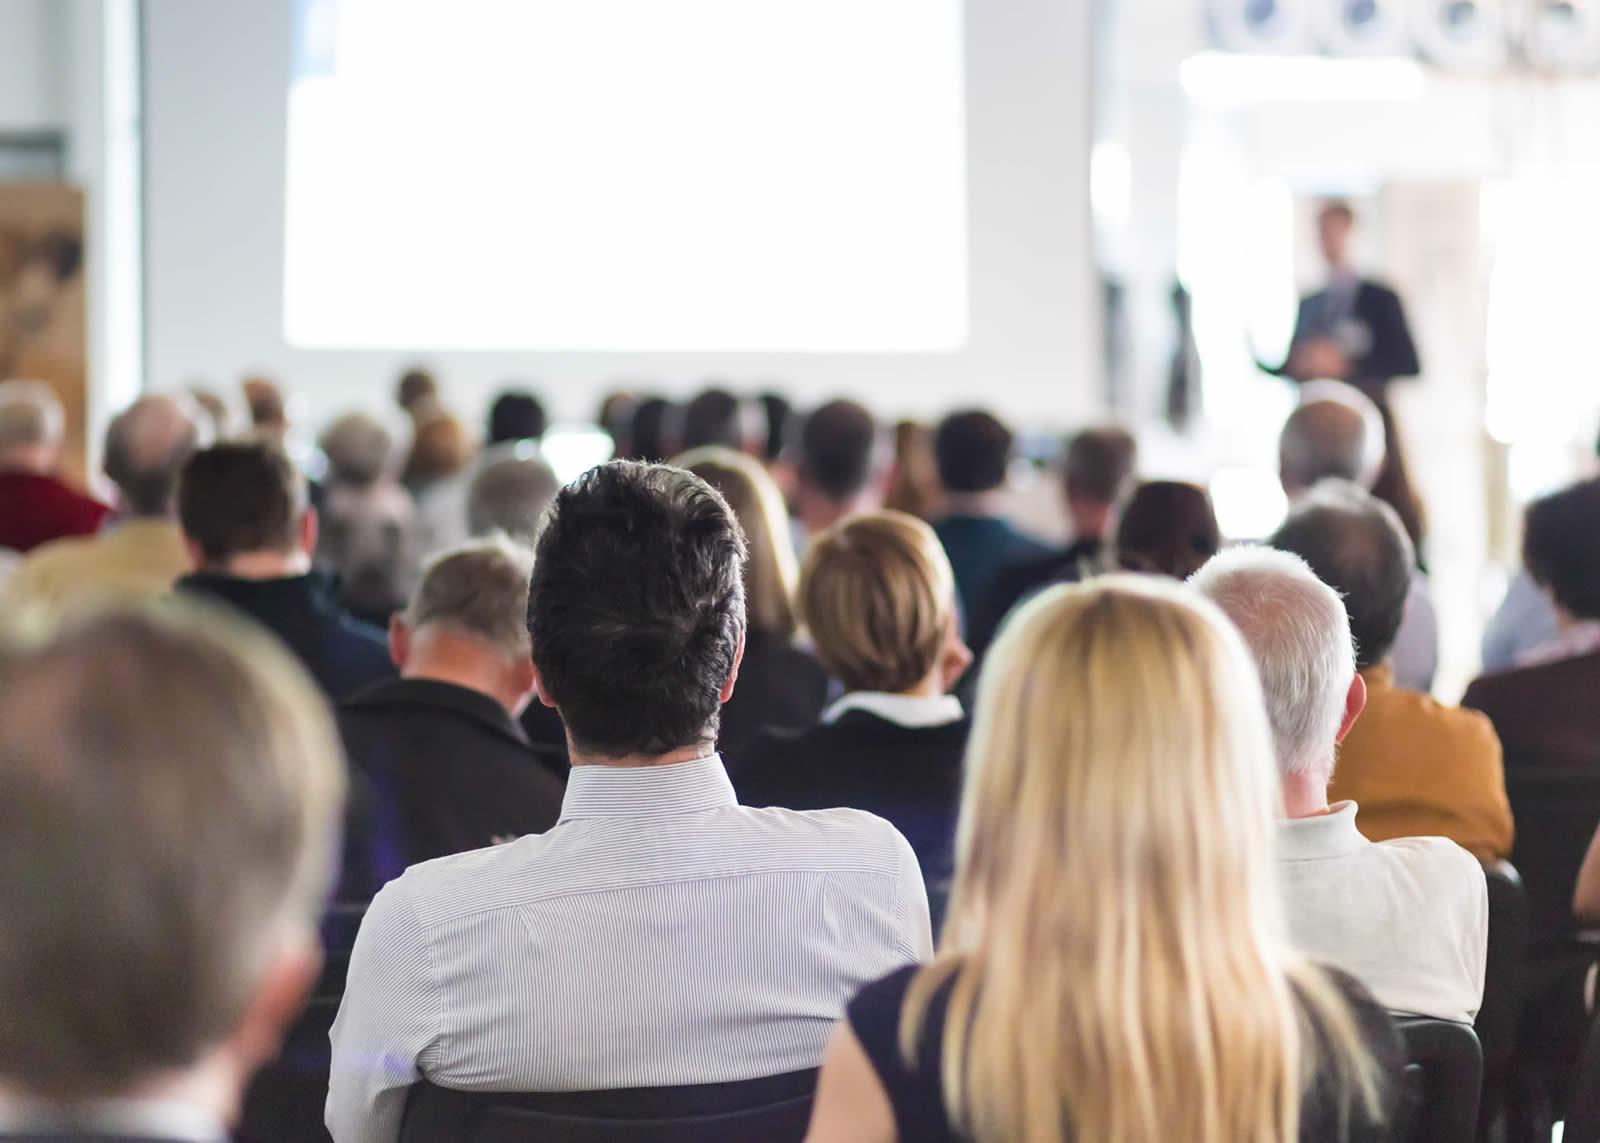 naem-2018-speaker-giving-talk-business-meeting-audience-700x500